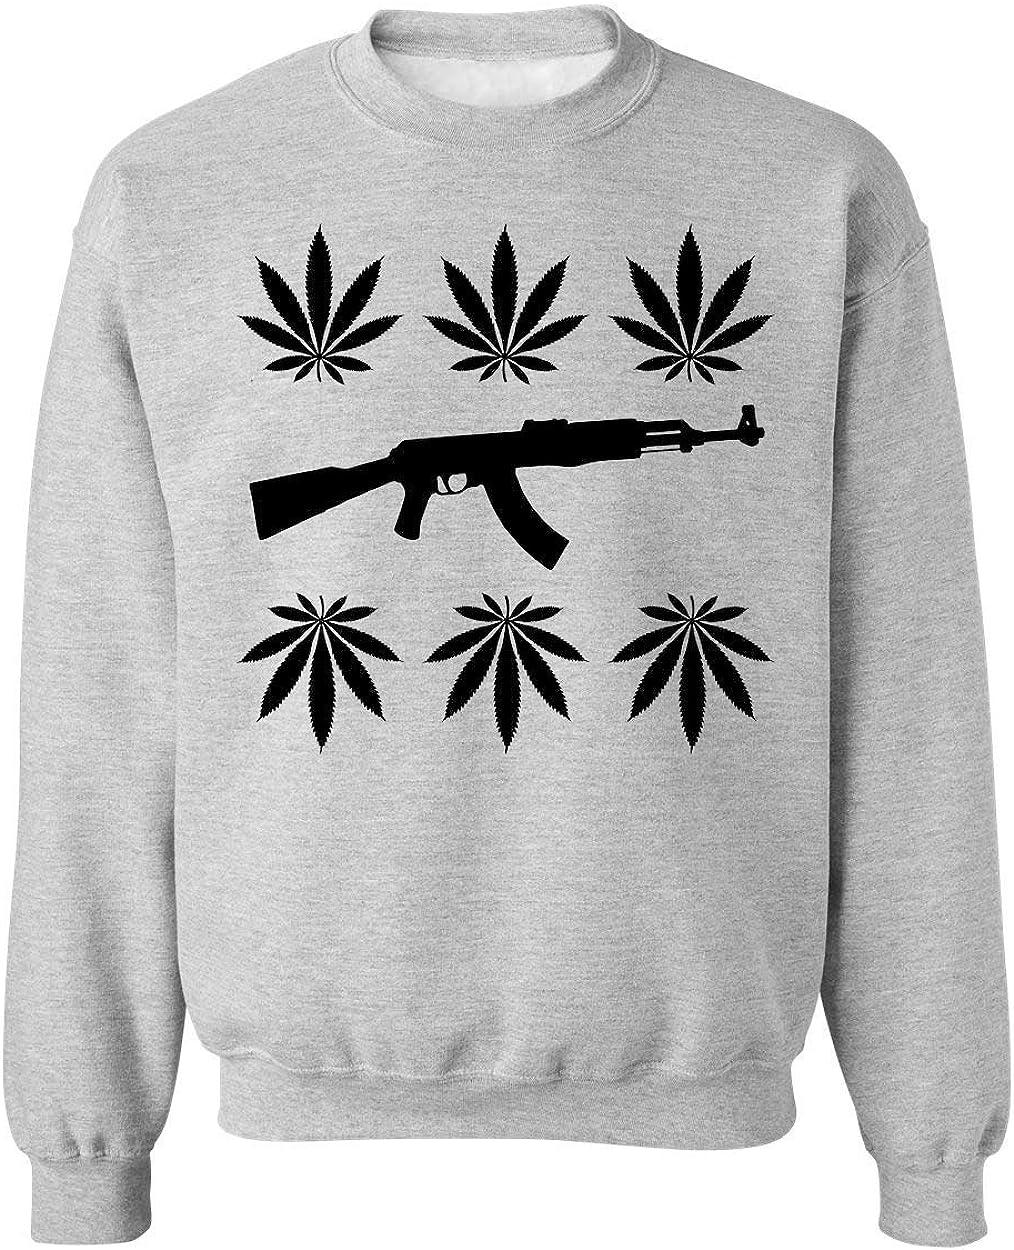 Brenos Design AK-47 Gun Cannabis Weed Marijuana Leaf 420 Unisexo Sudadera Suéter Medium